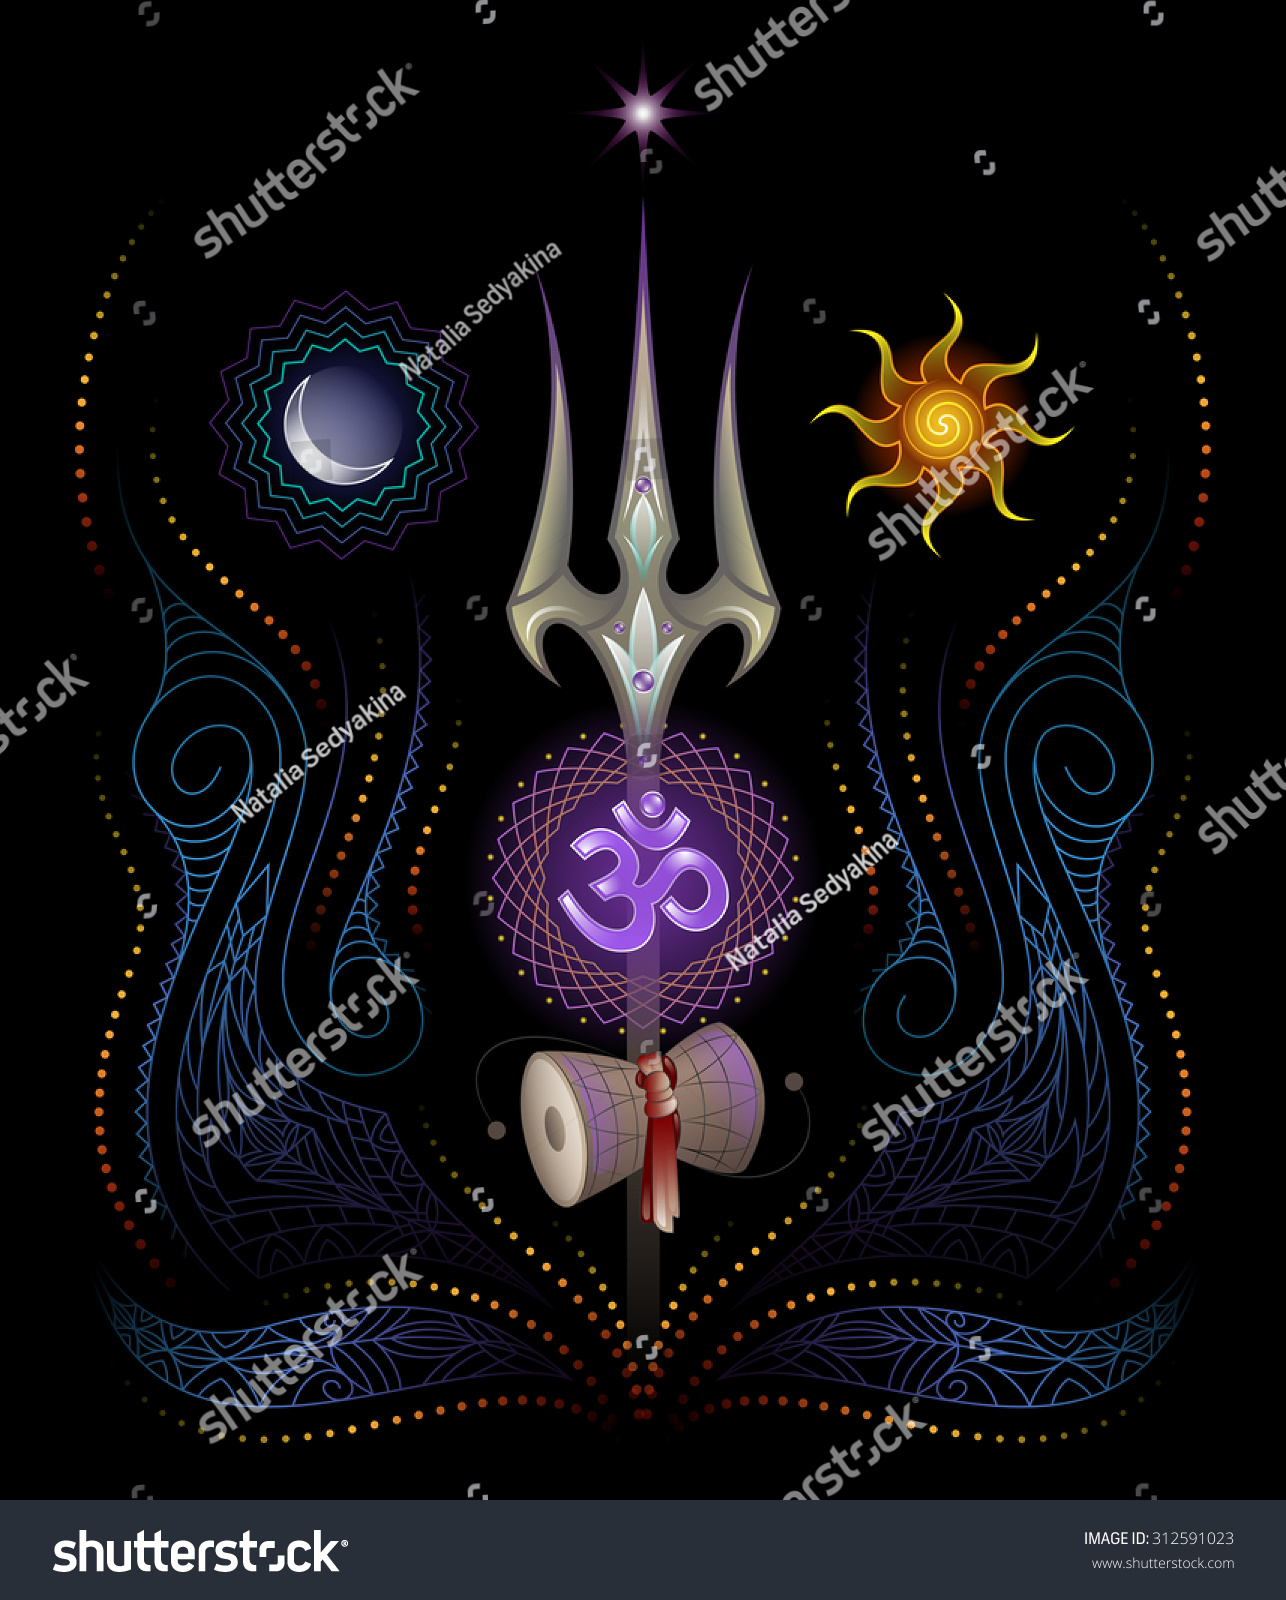 Lord shiva trishul picture - Sacred Symbols Of Yoga And Lord Shiva Trishul Sound Om And Drum Damaru